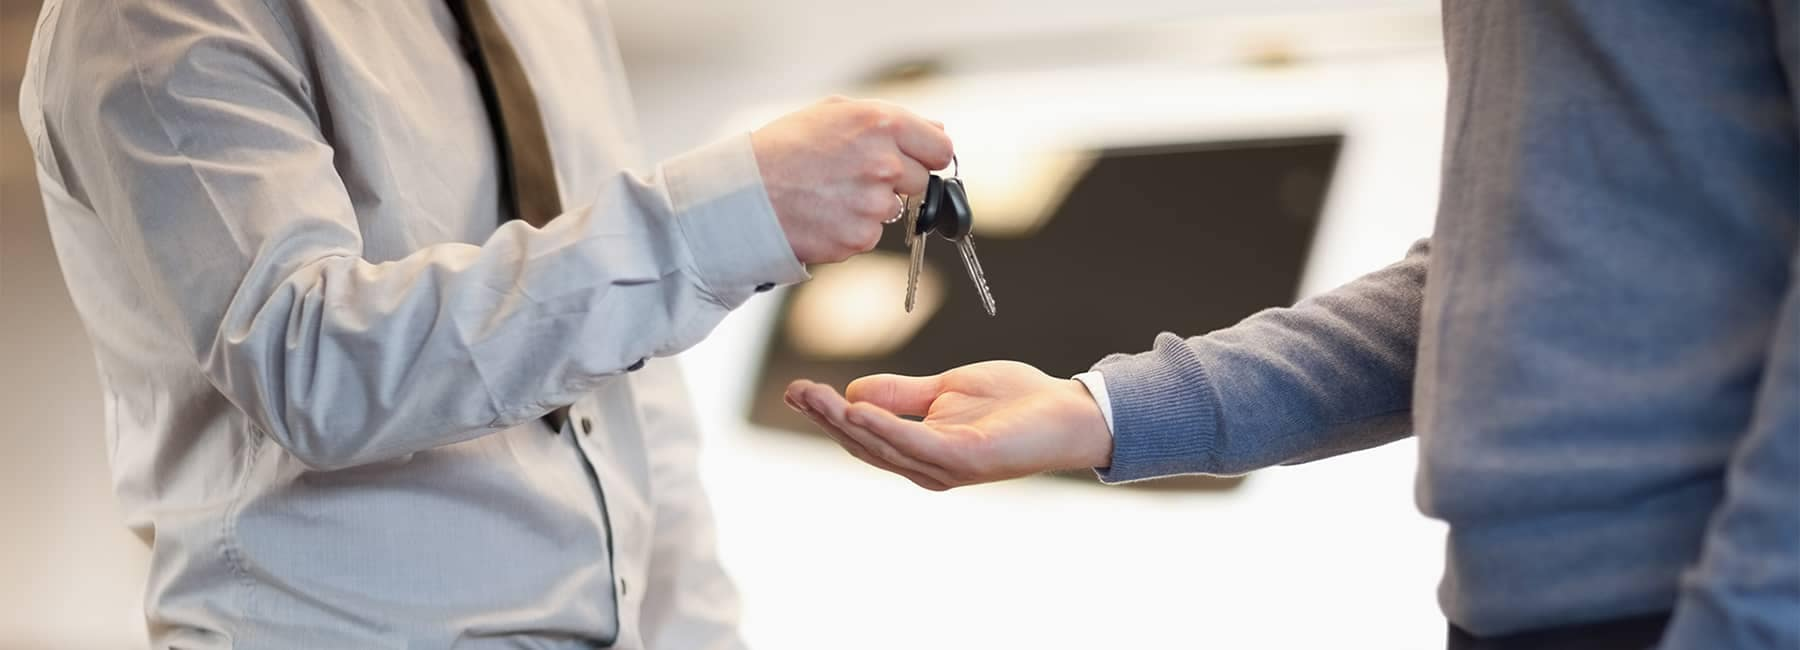 Salesman Handing Car Keys to Man